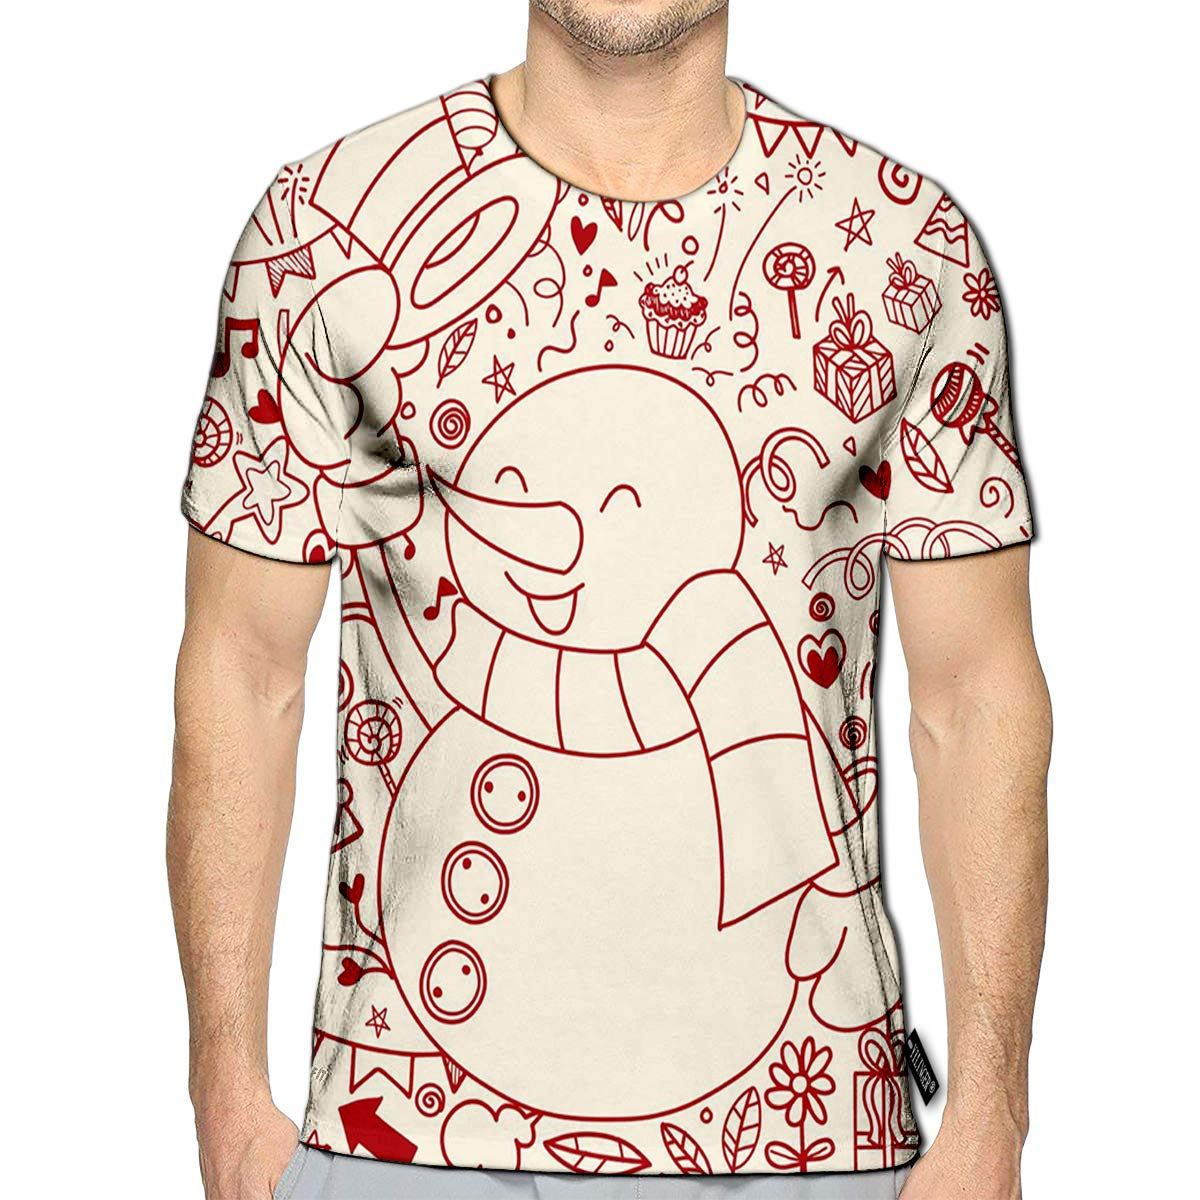 YILINGER 3D Printed T-Shirts Tooth Shape Grunge Sunburst Short Sleeve Tops Tees